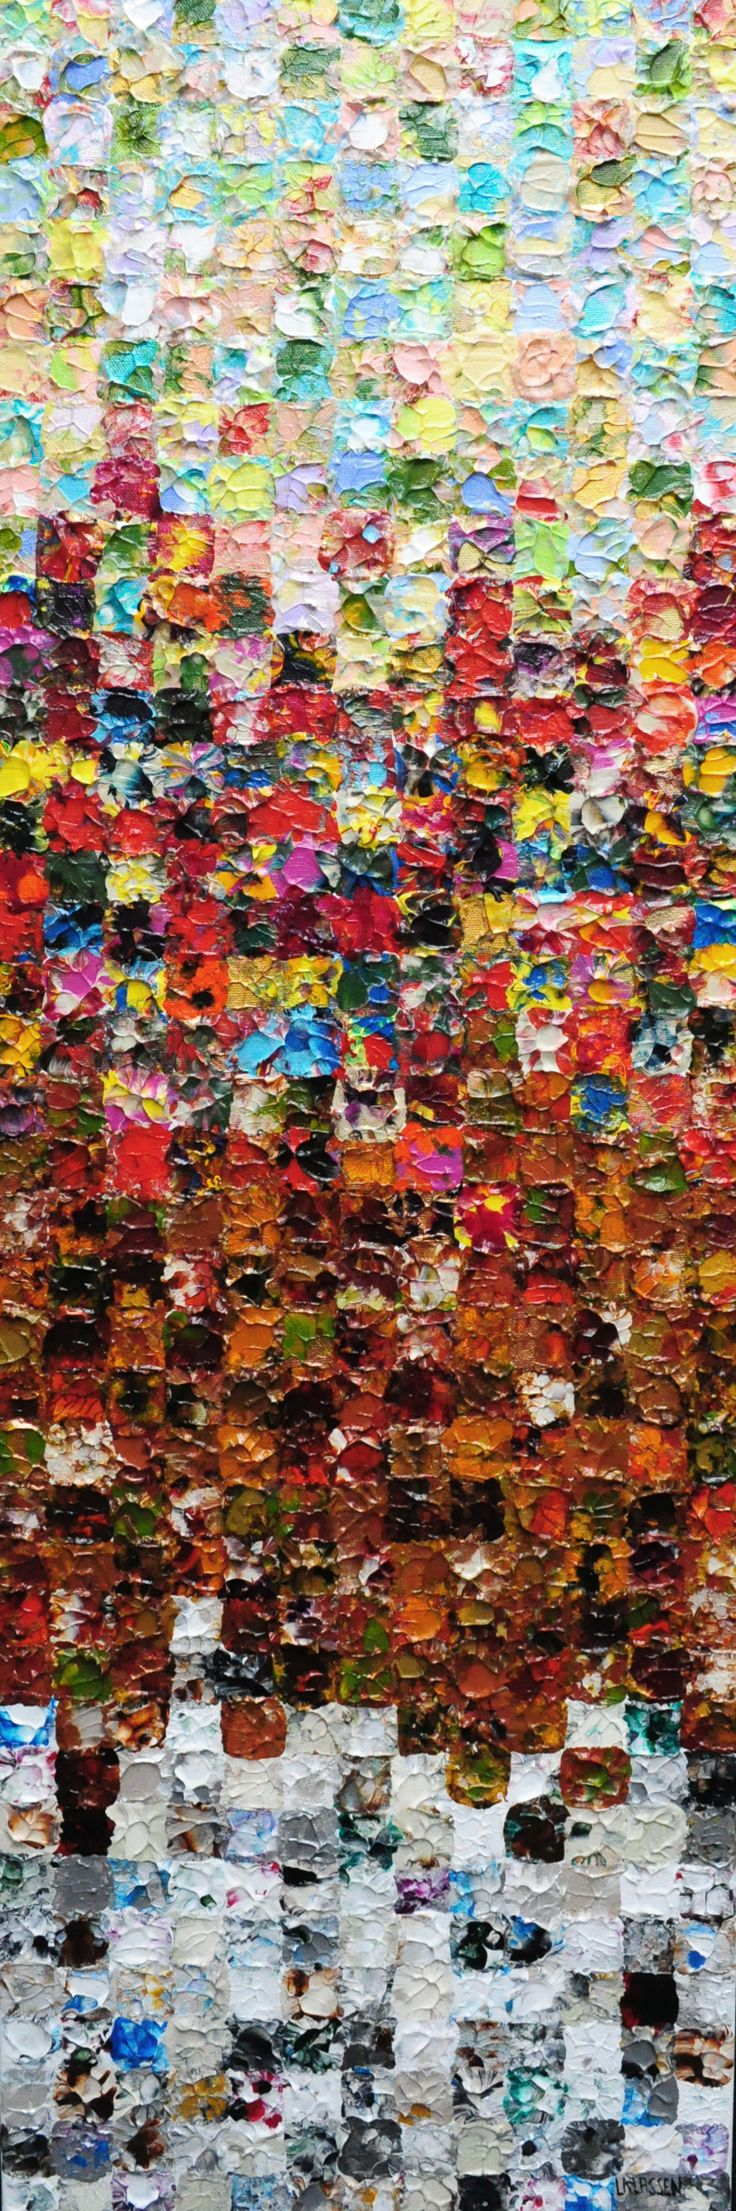 Four Seasons, Acrylic on canvas, 36 x 12 inches